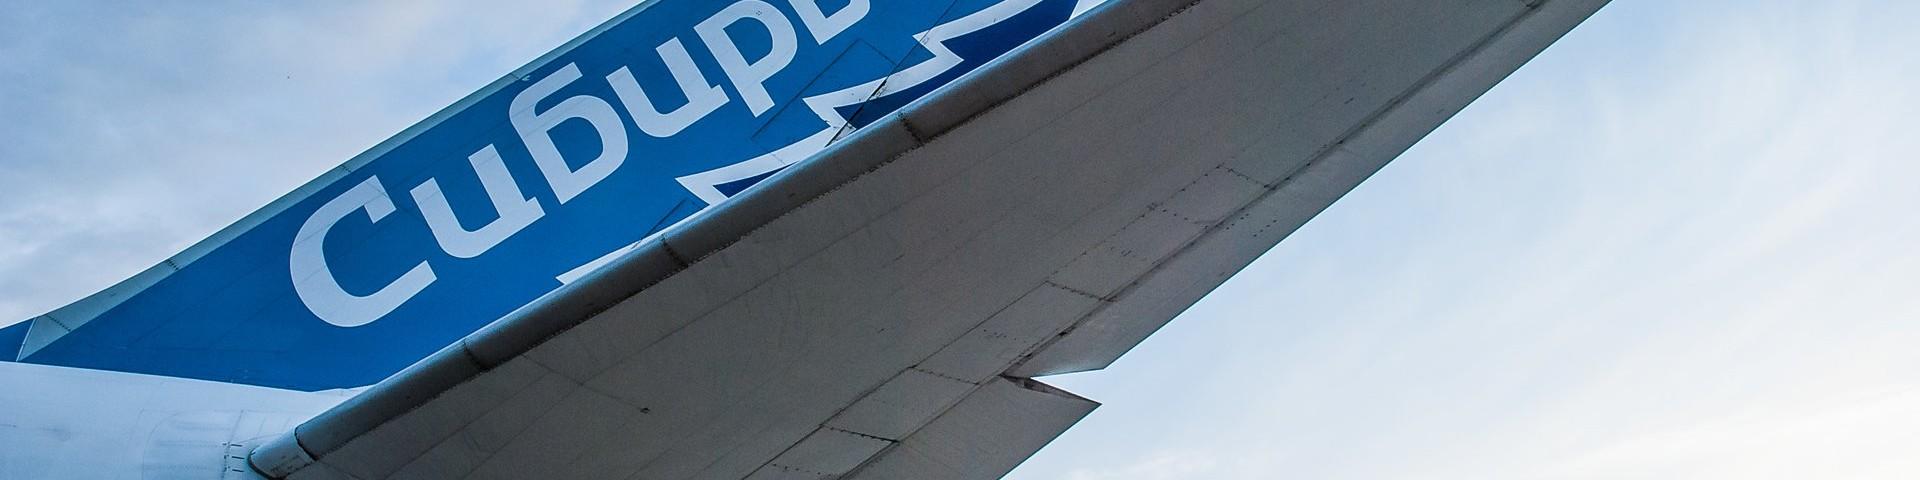 Ил 86 авиакомпании Сибирь